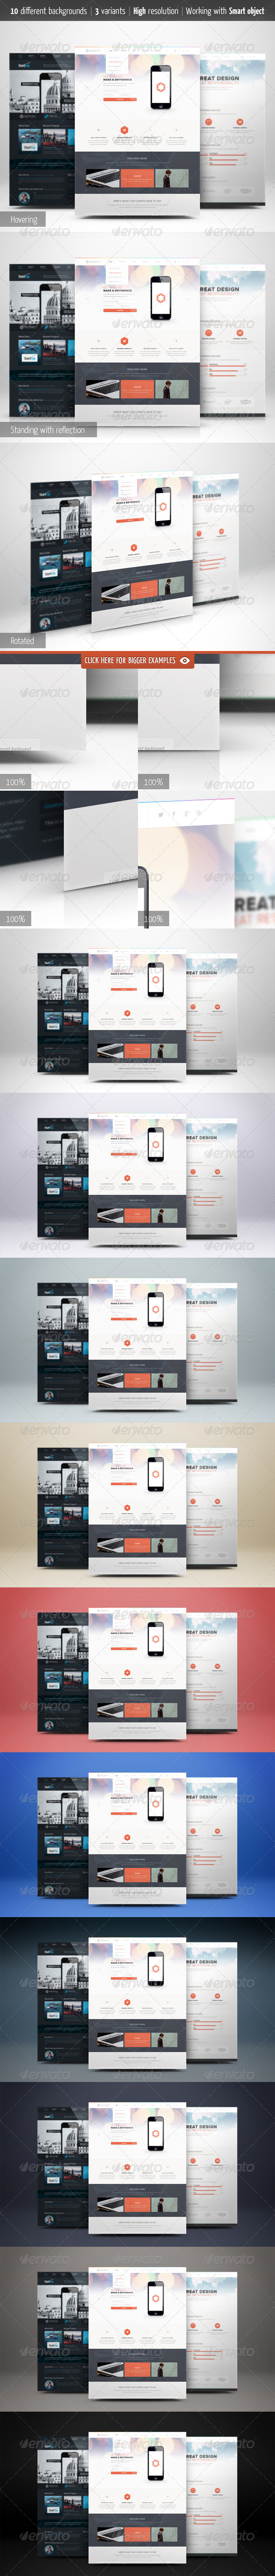 GraphicRiver Web Page Presentation Mockup with Studio Backdrops 5946642